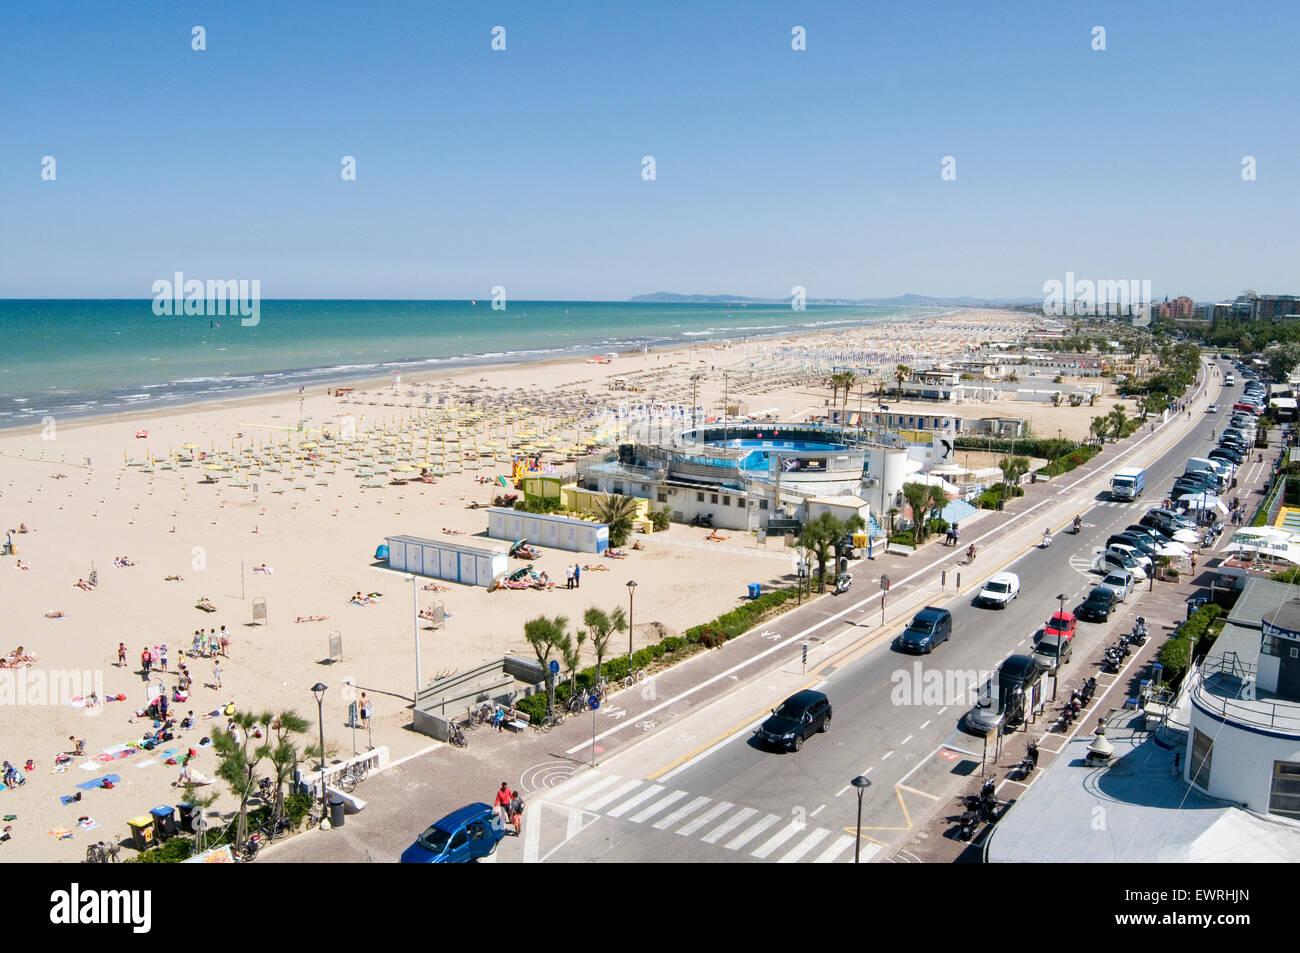 rimini italy italian beach beaches Emilia Romagna region Adriatic Sea resort resorts east coast eastern coastal - Stock Image